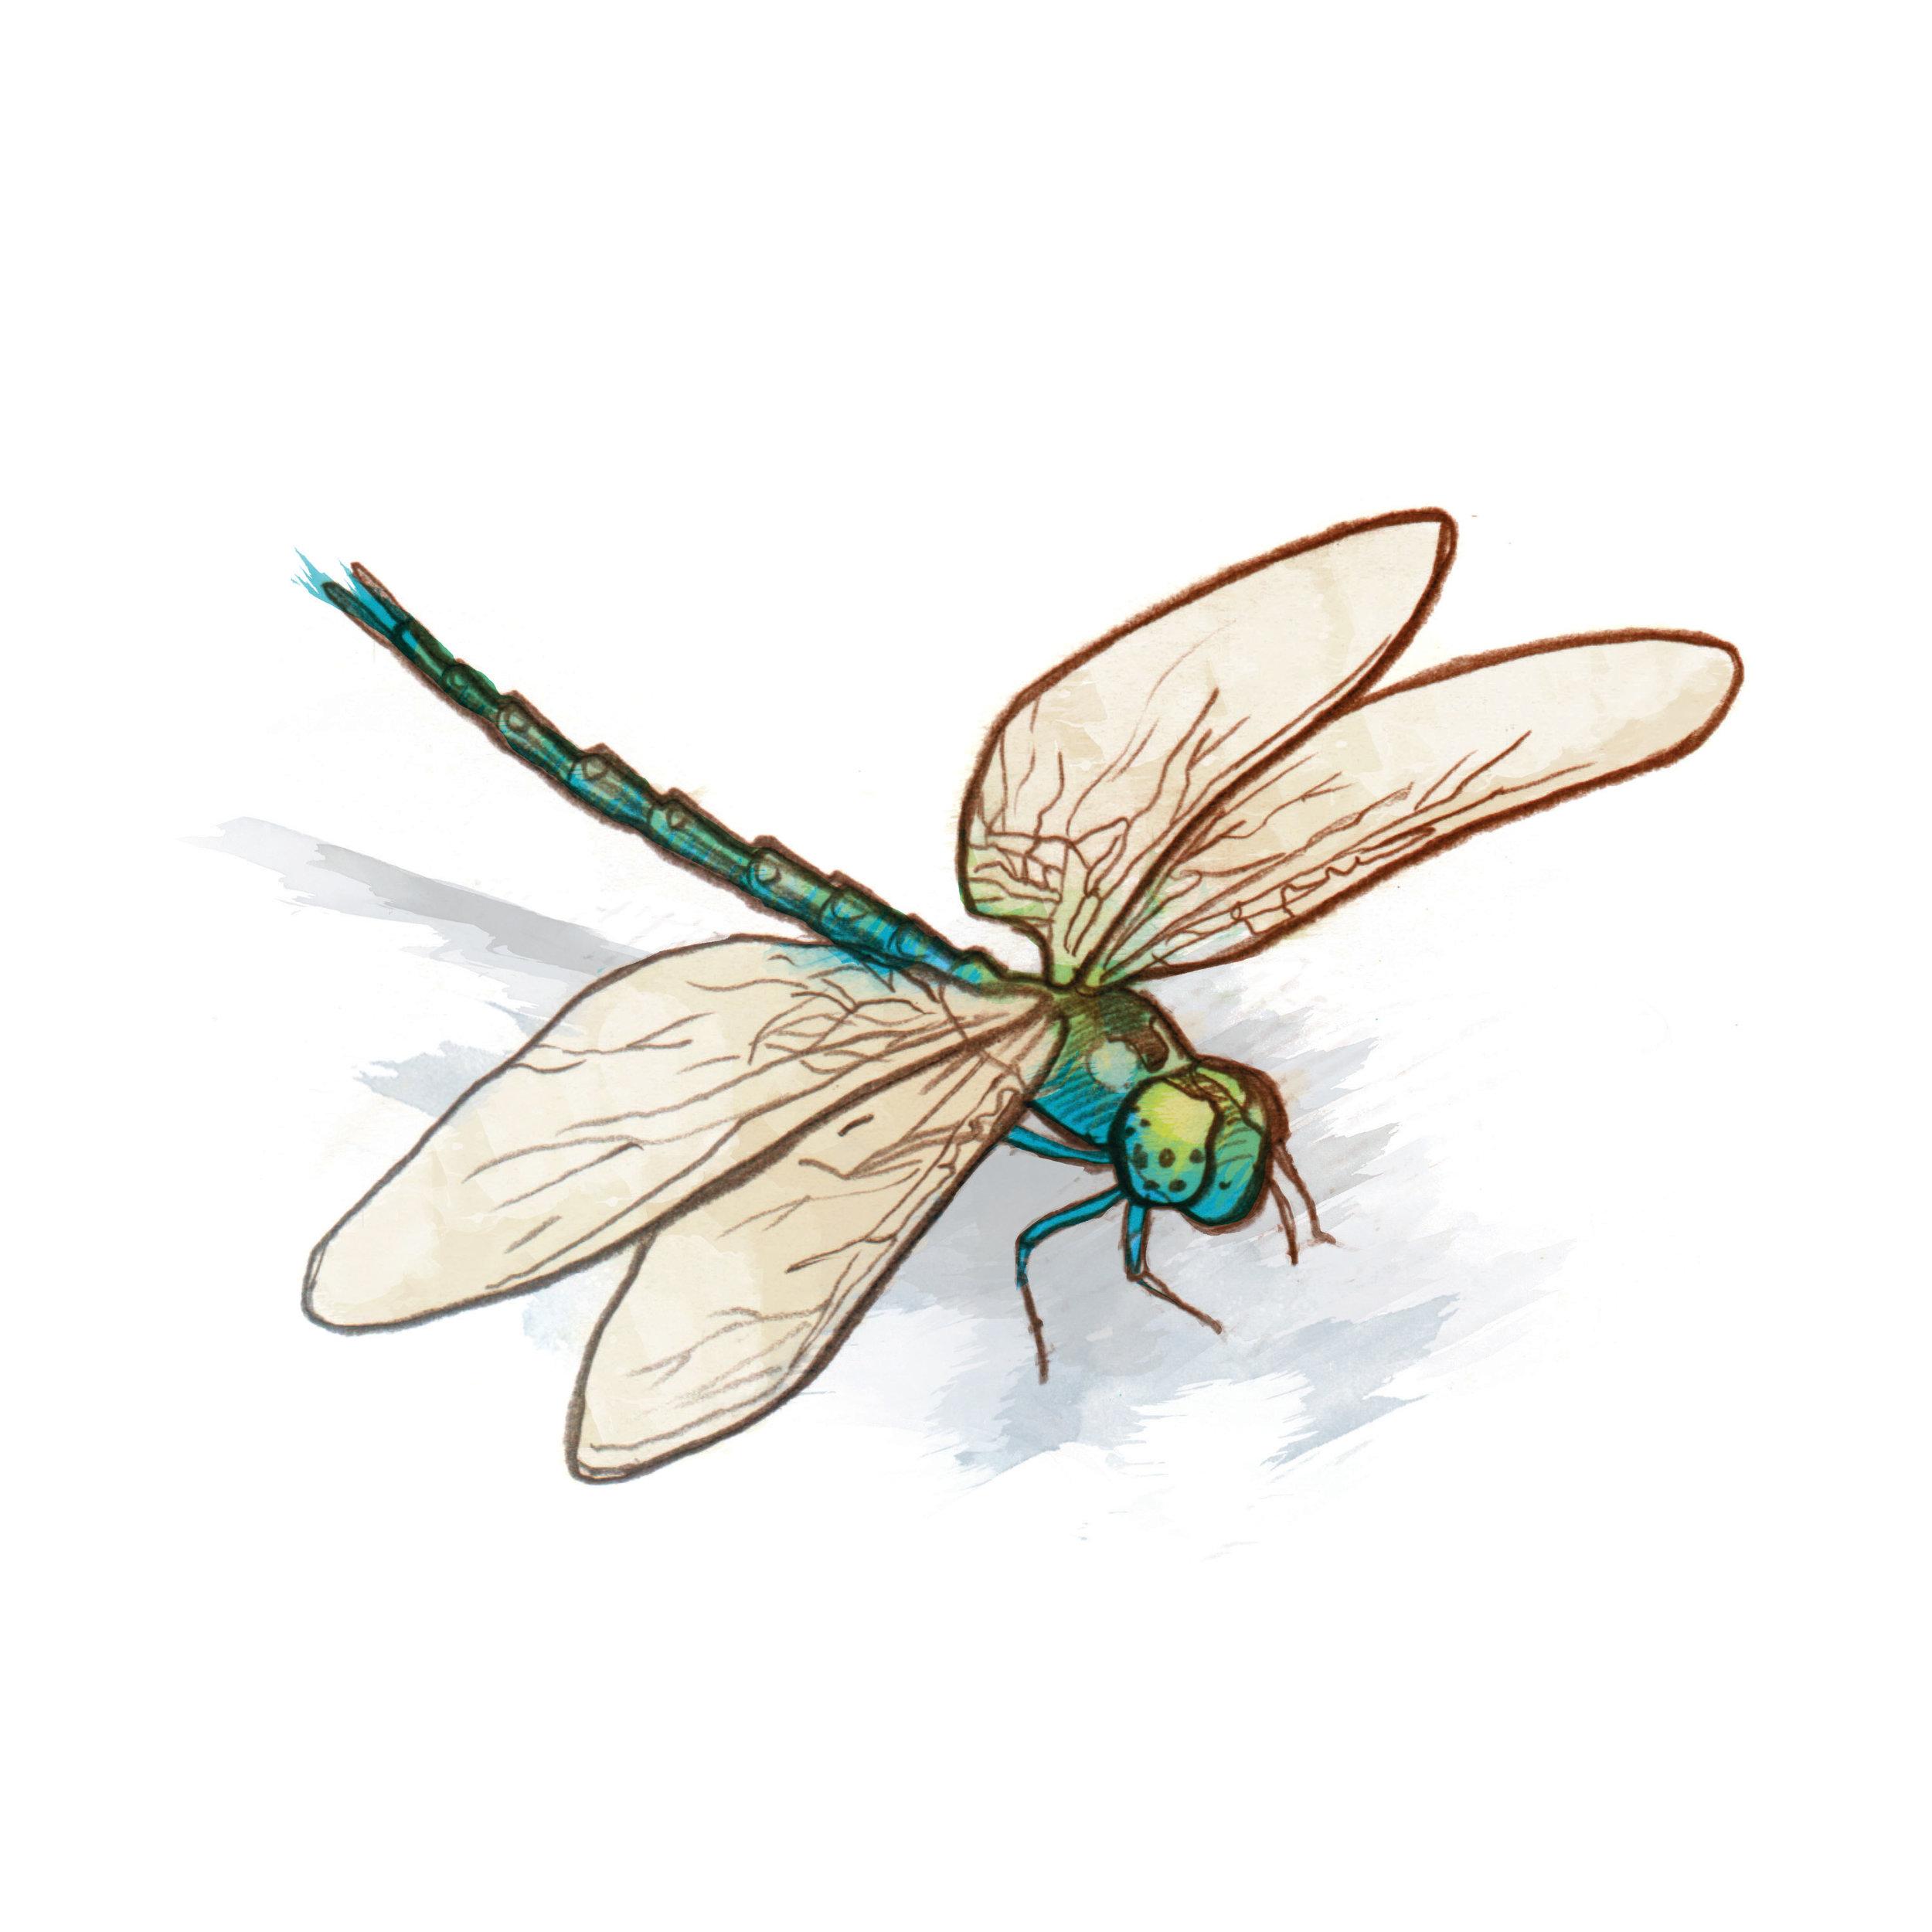 MLC_Keswick_WetlandSignage_Dragonfly_040816_v2.jpg